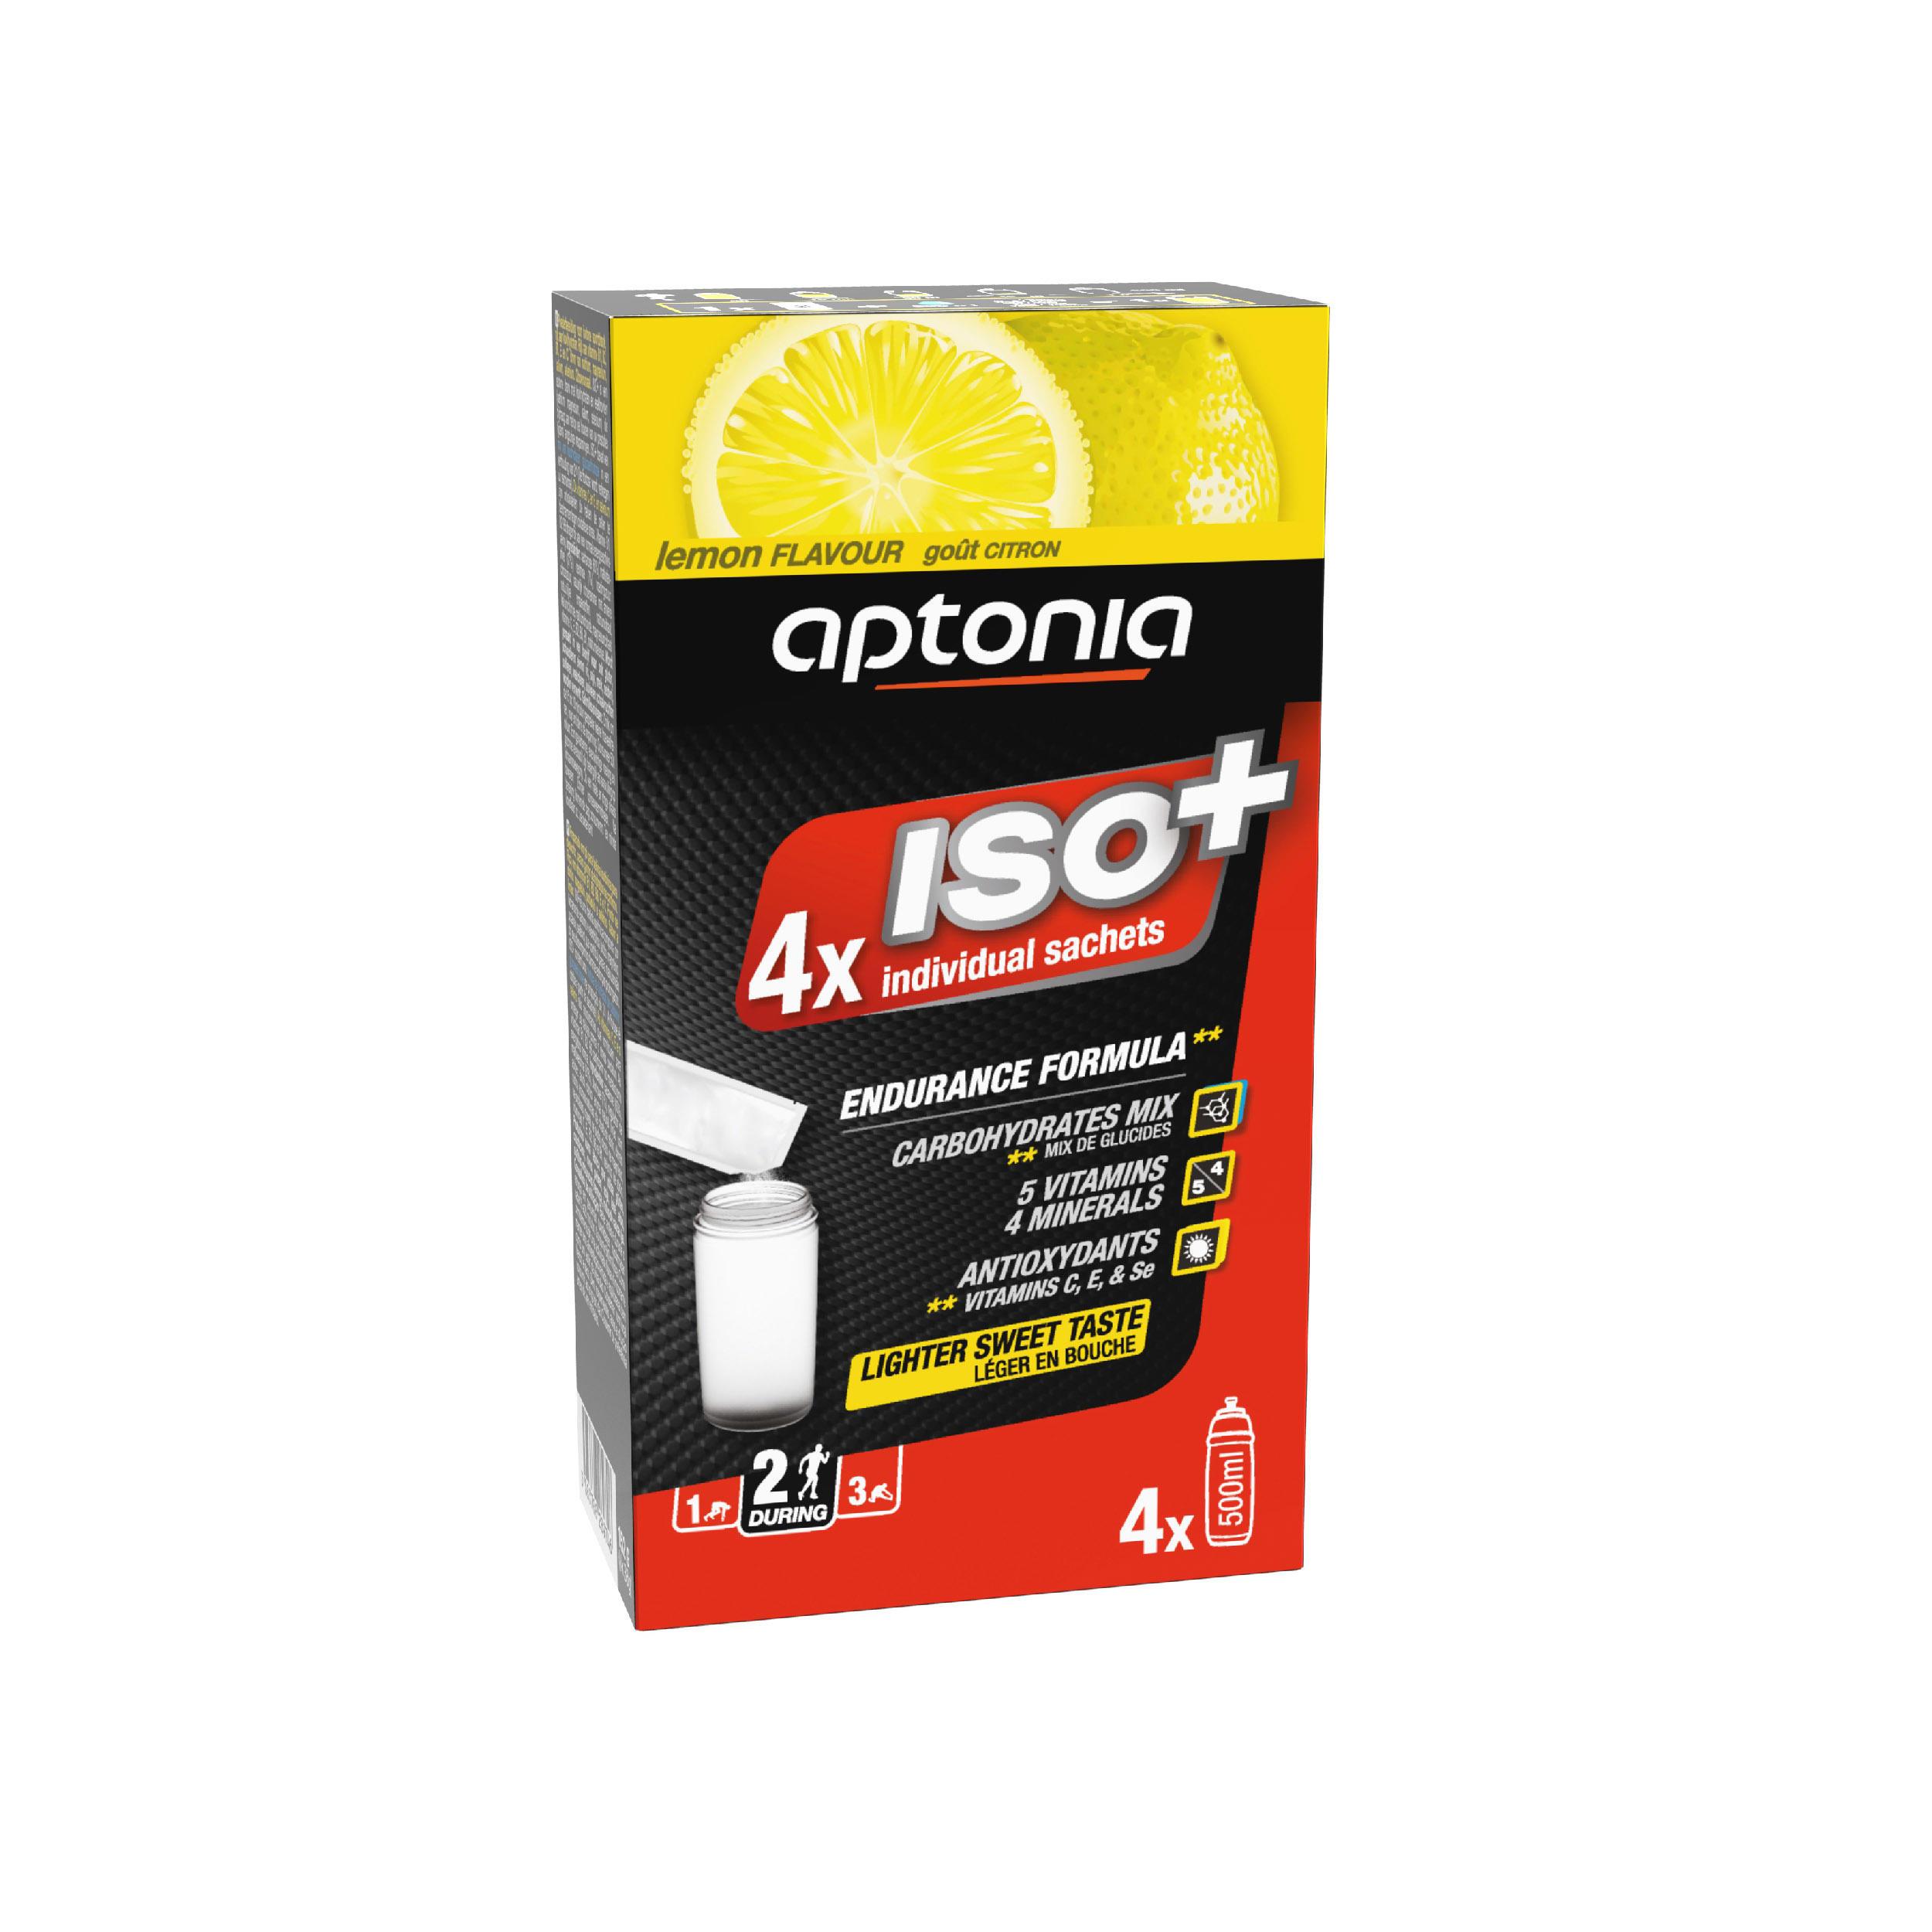 Isotone drank in poedervorm ISO+ citroen 4x 38 g